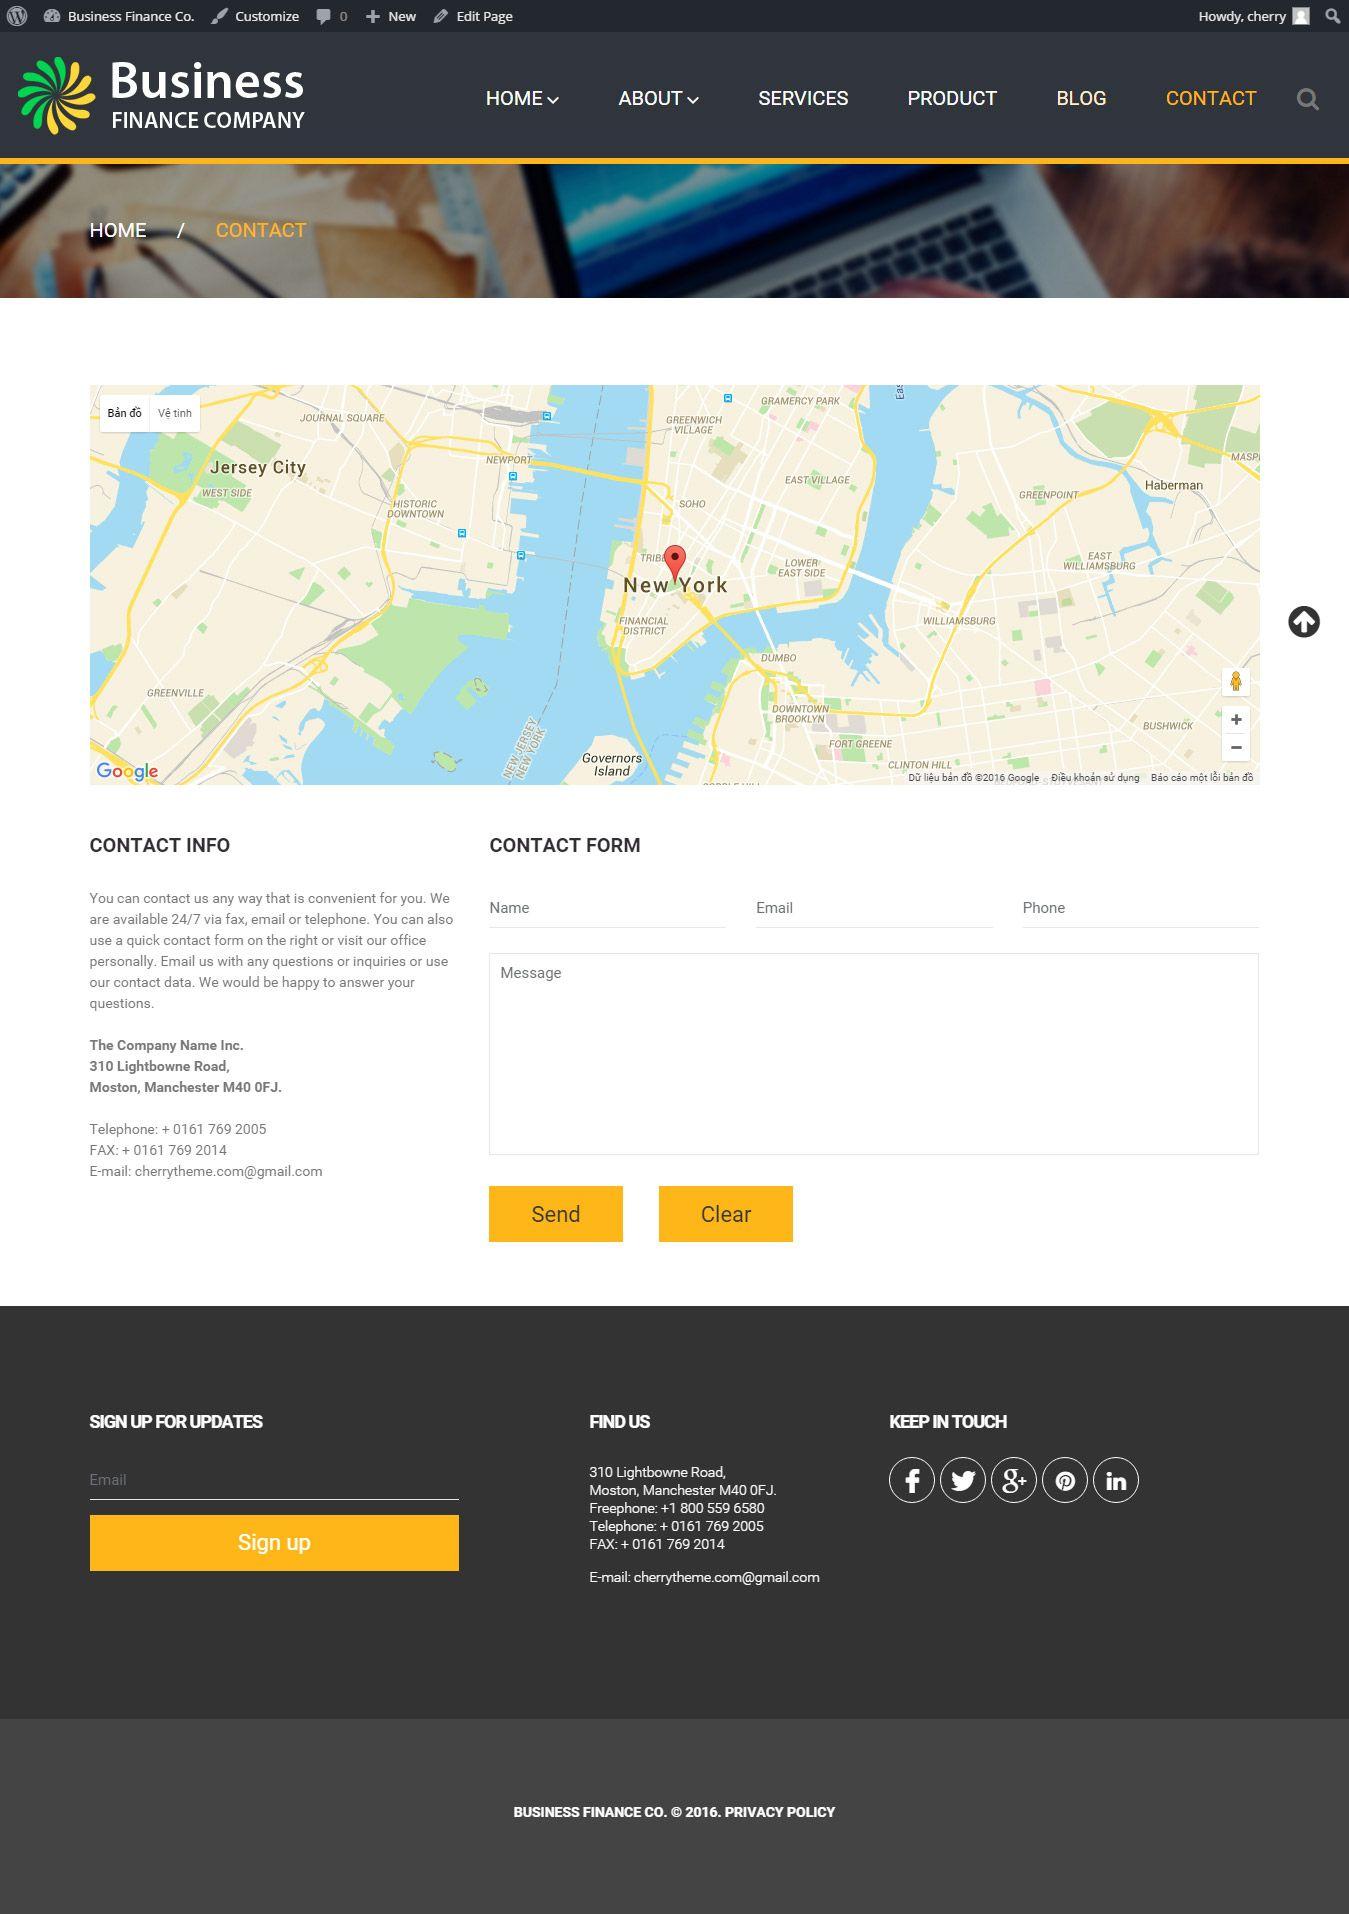 Business Finance - WordPress Business Theme - Codester